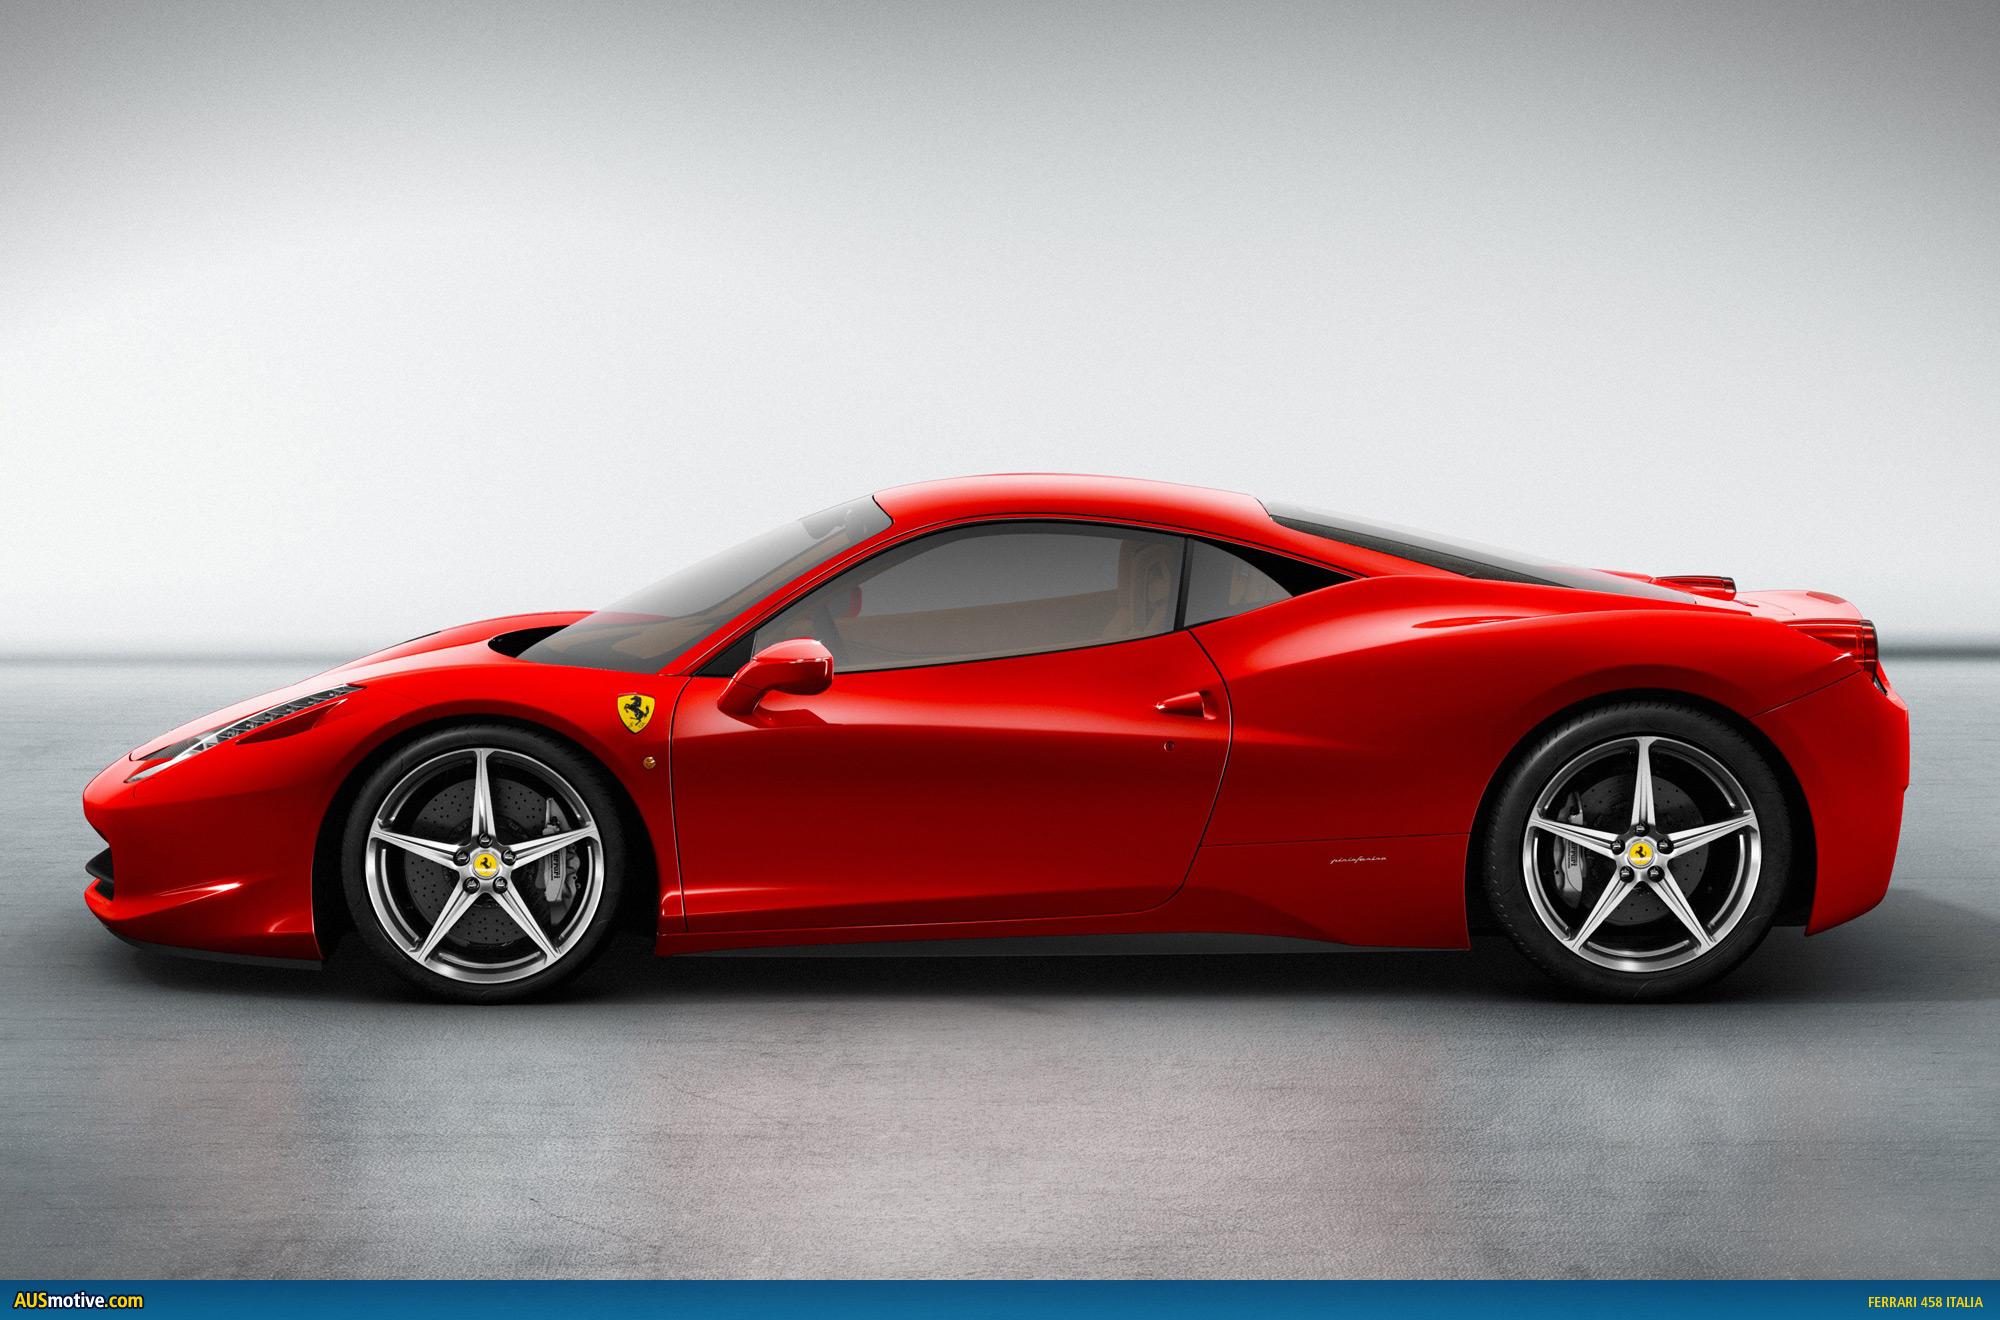 motor with Ferrari 458 Italia 7 on Dsc01926 I203453489 as well Fahrzeugschein 528i I202905433 further chopper Club in addition Motorbike Icon together with Show 1586 2.